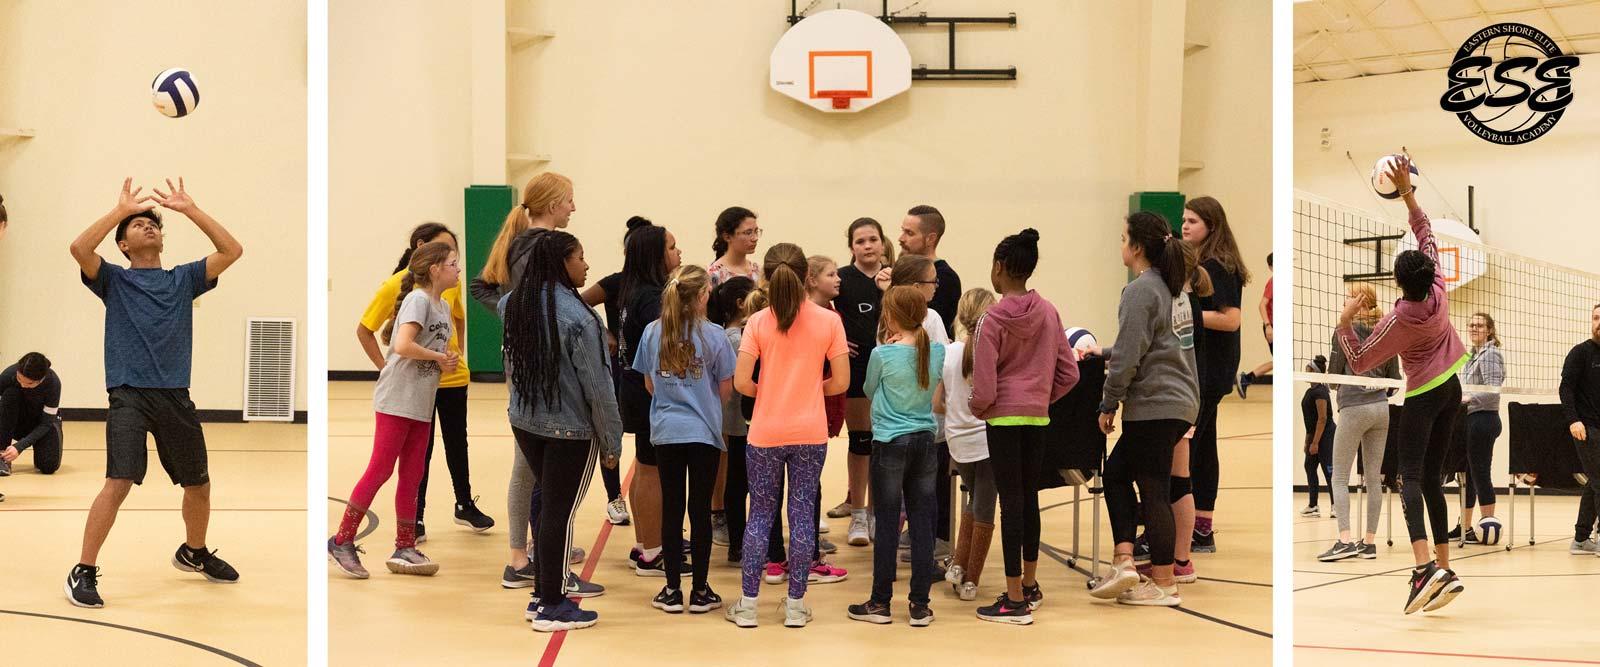 Volleyball - Eastern Shore Elite Volleyball Academy Instructional Program